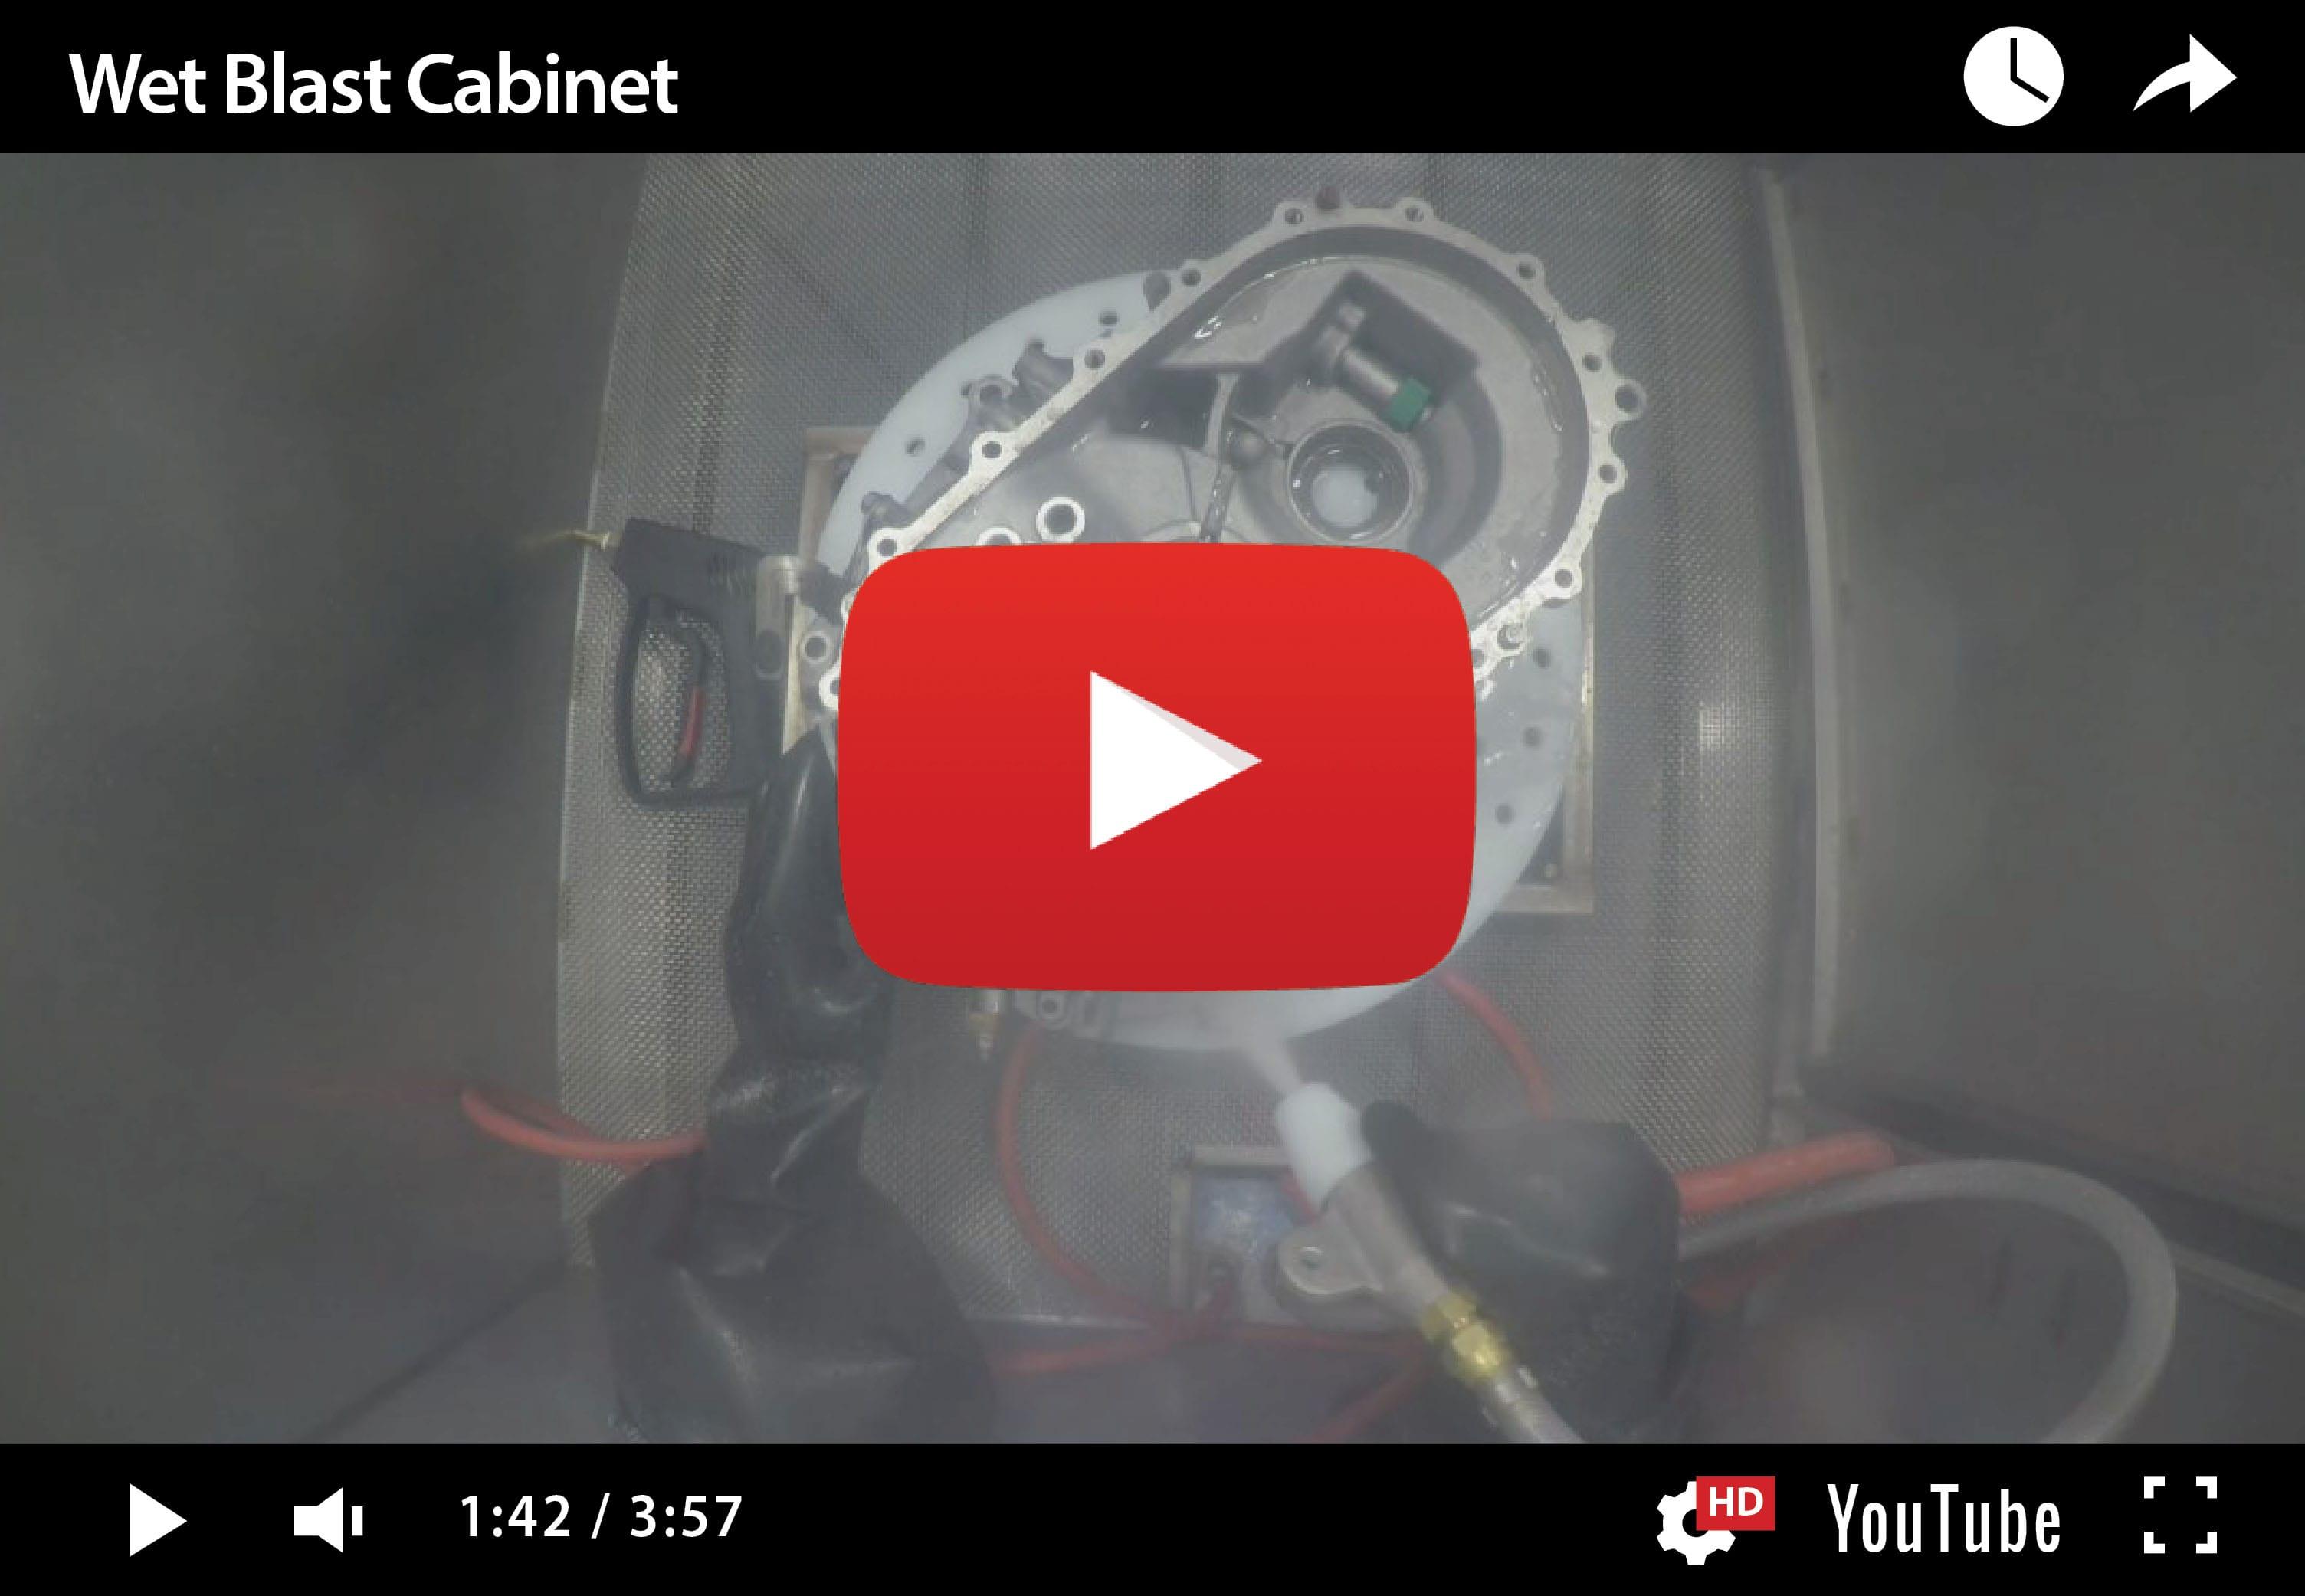 Wet Blast Cabinets